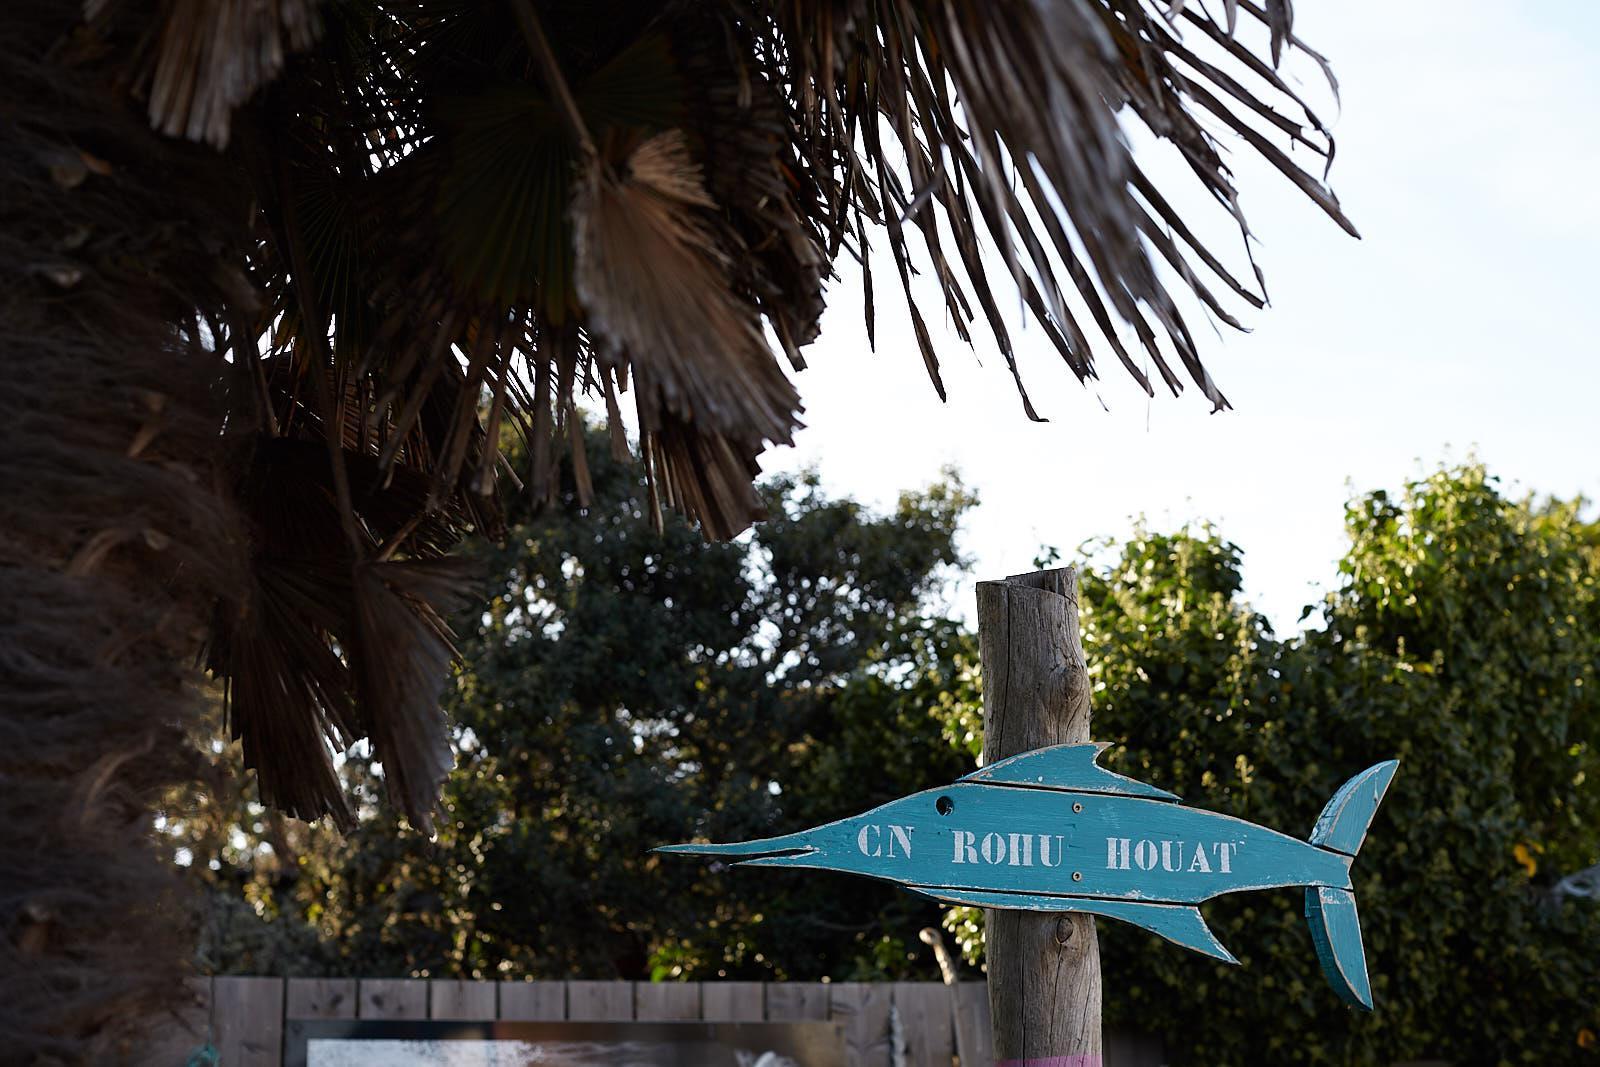 Club Nautique du Rohu - Grande Plage de Houat